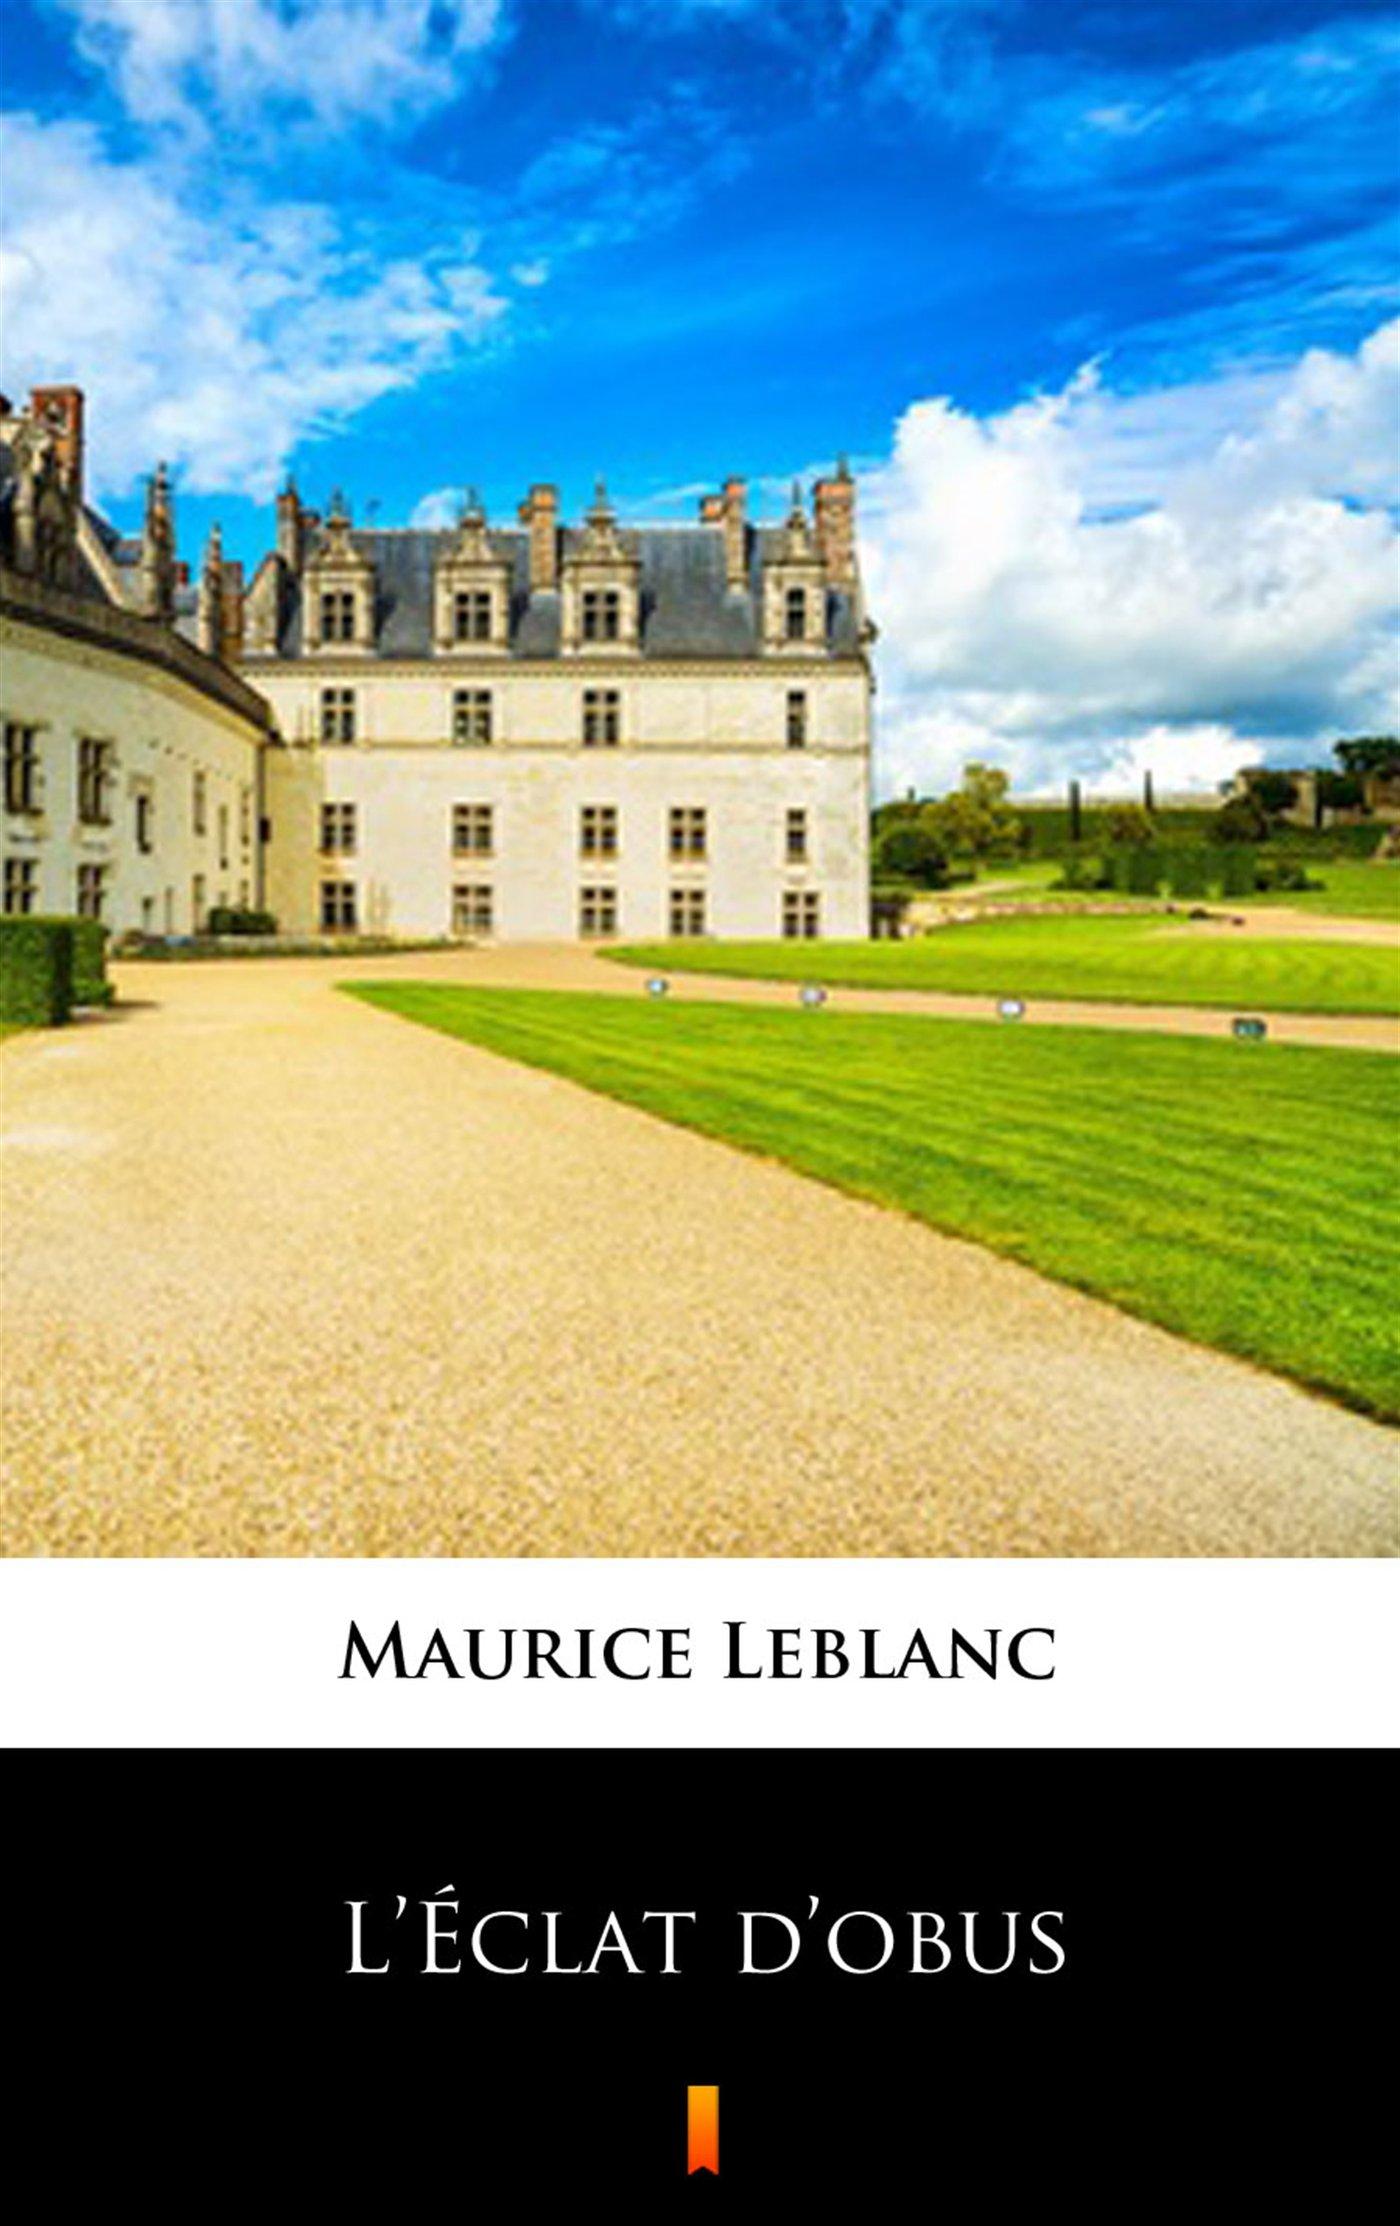 L Eclat d obus - Ebook (Książka EPUB) do pobrania w formacie EPUB